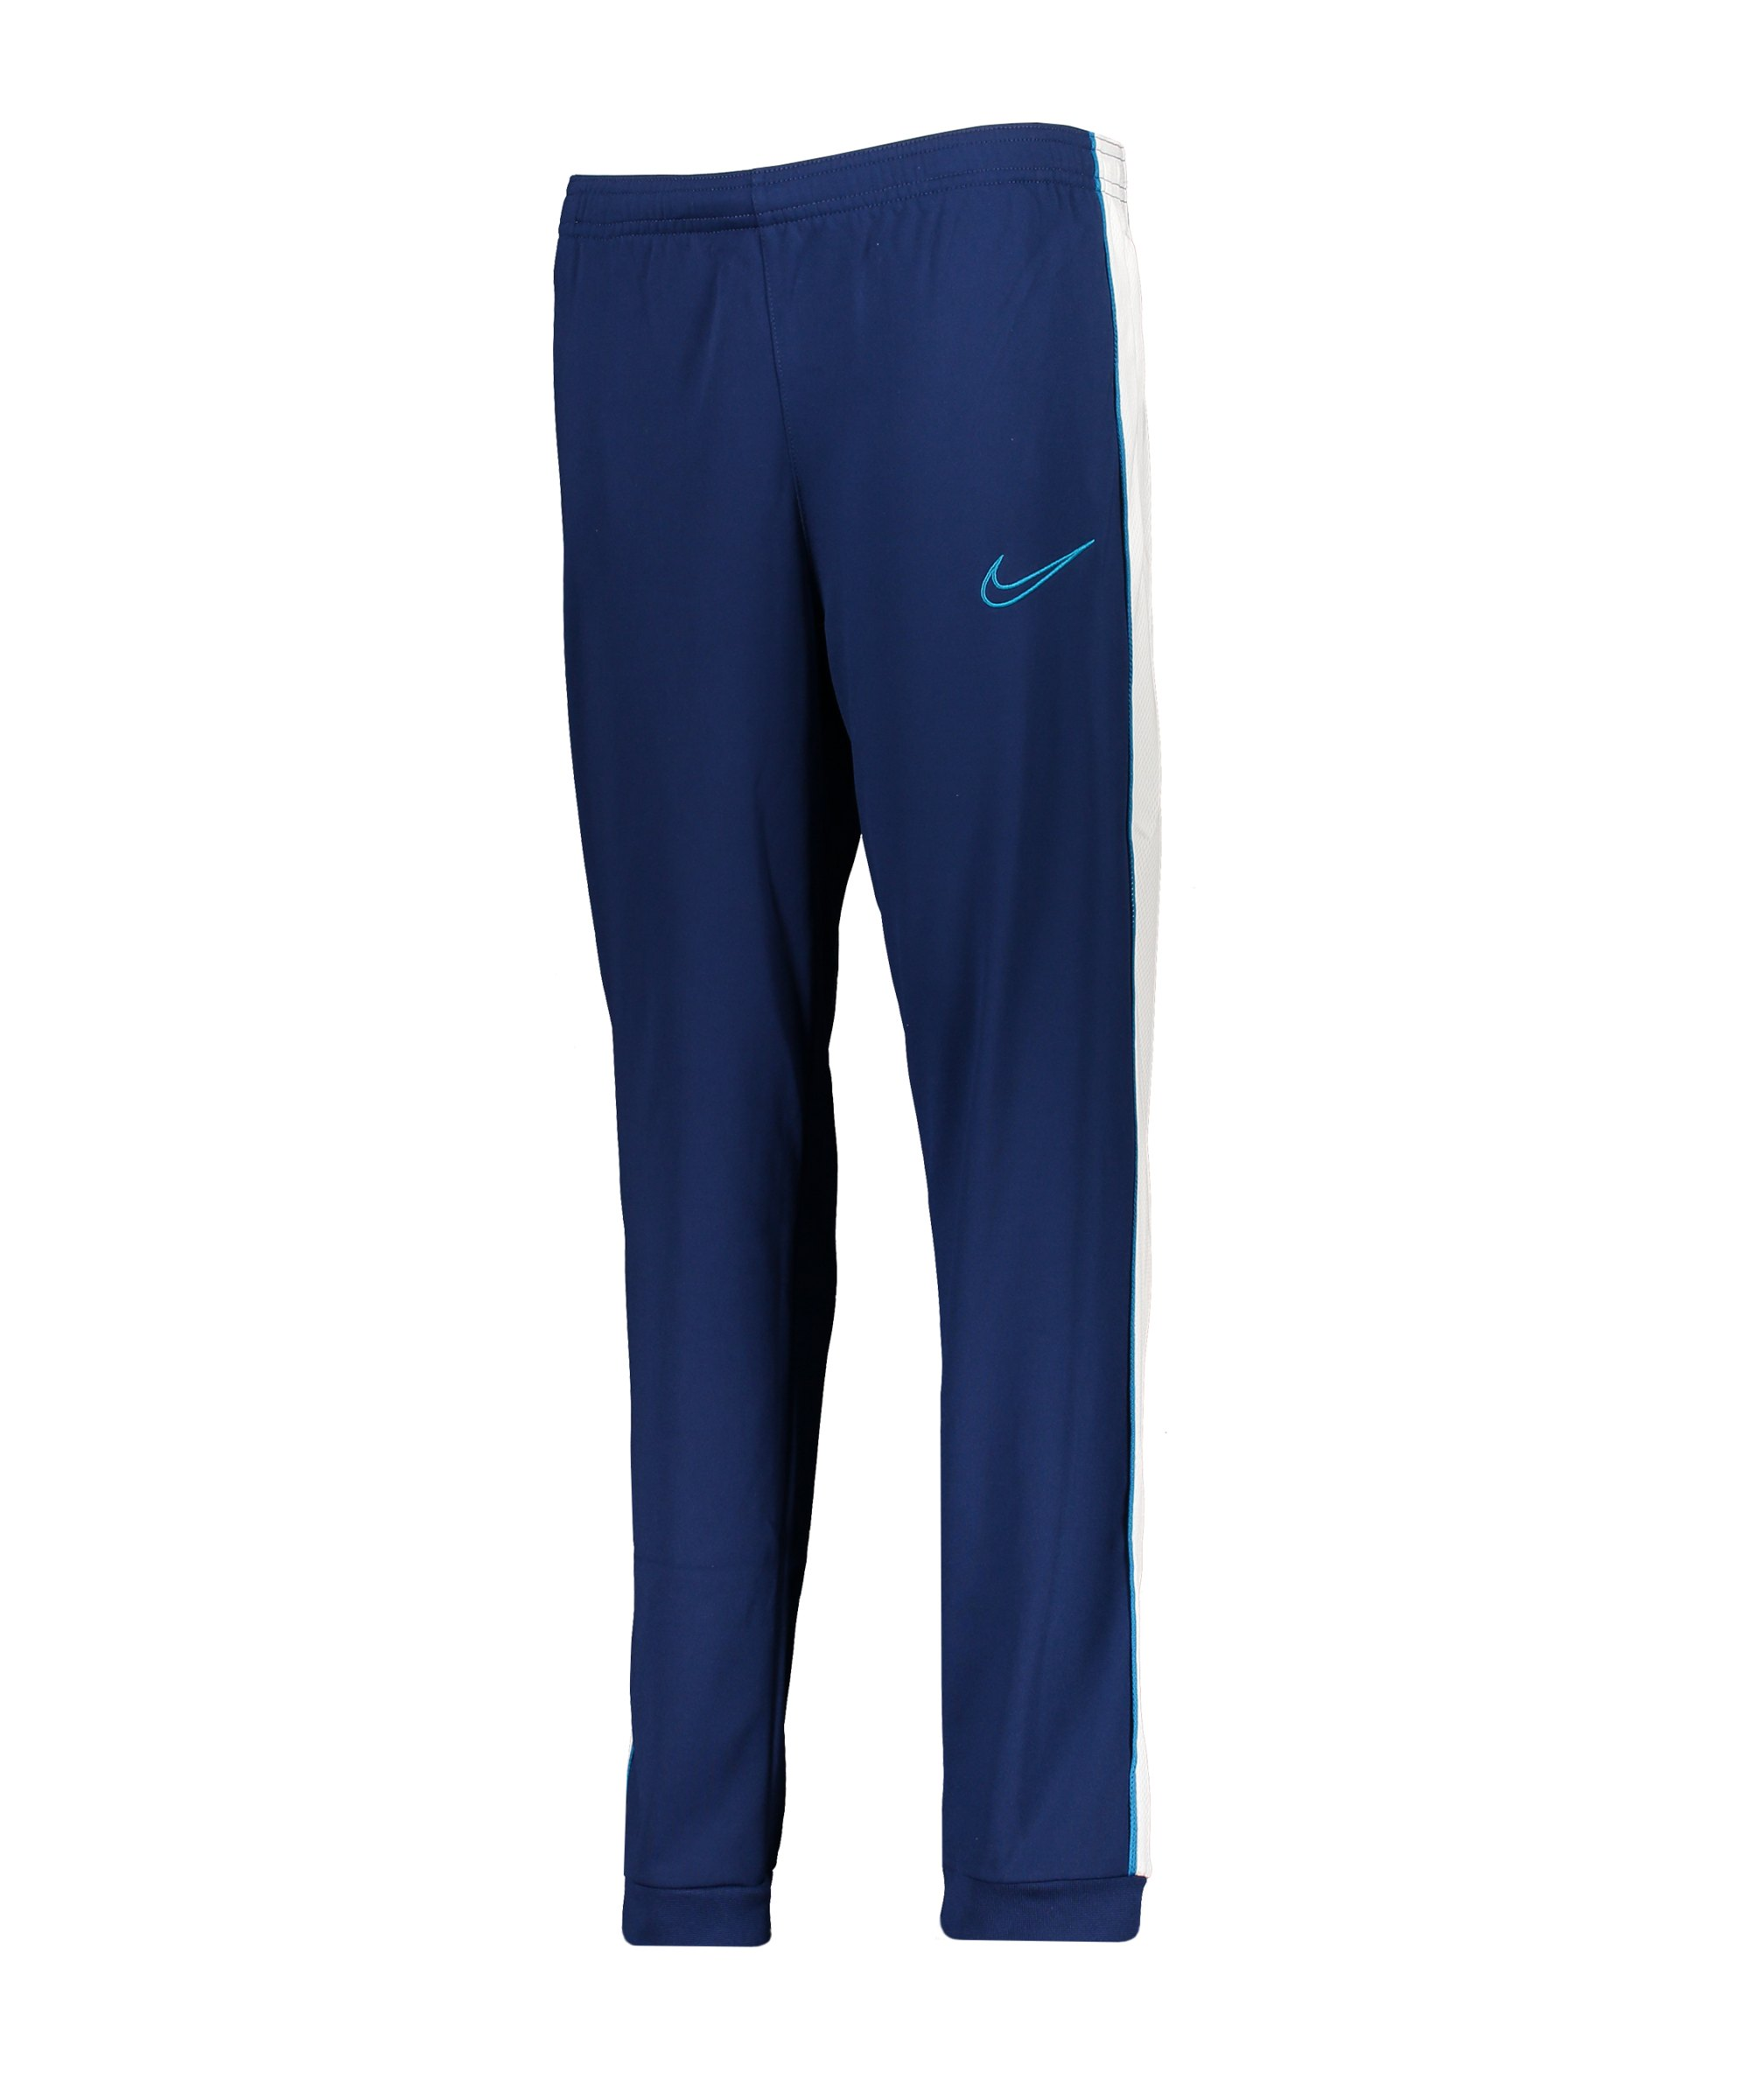 Nike Dry Academy Trainingshose Kids Blau F492 - blau